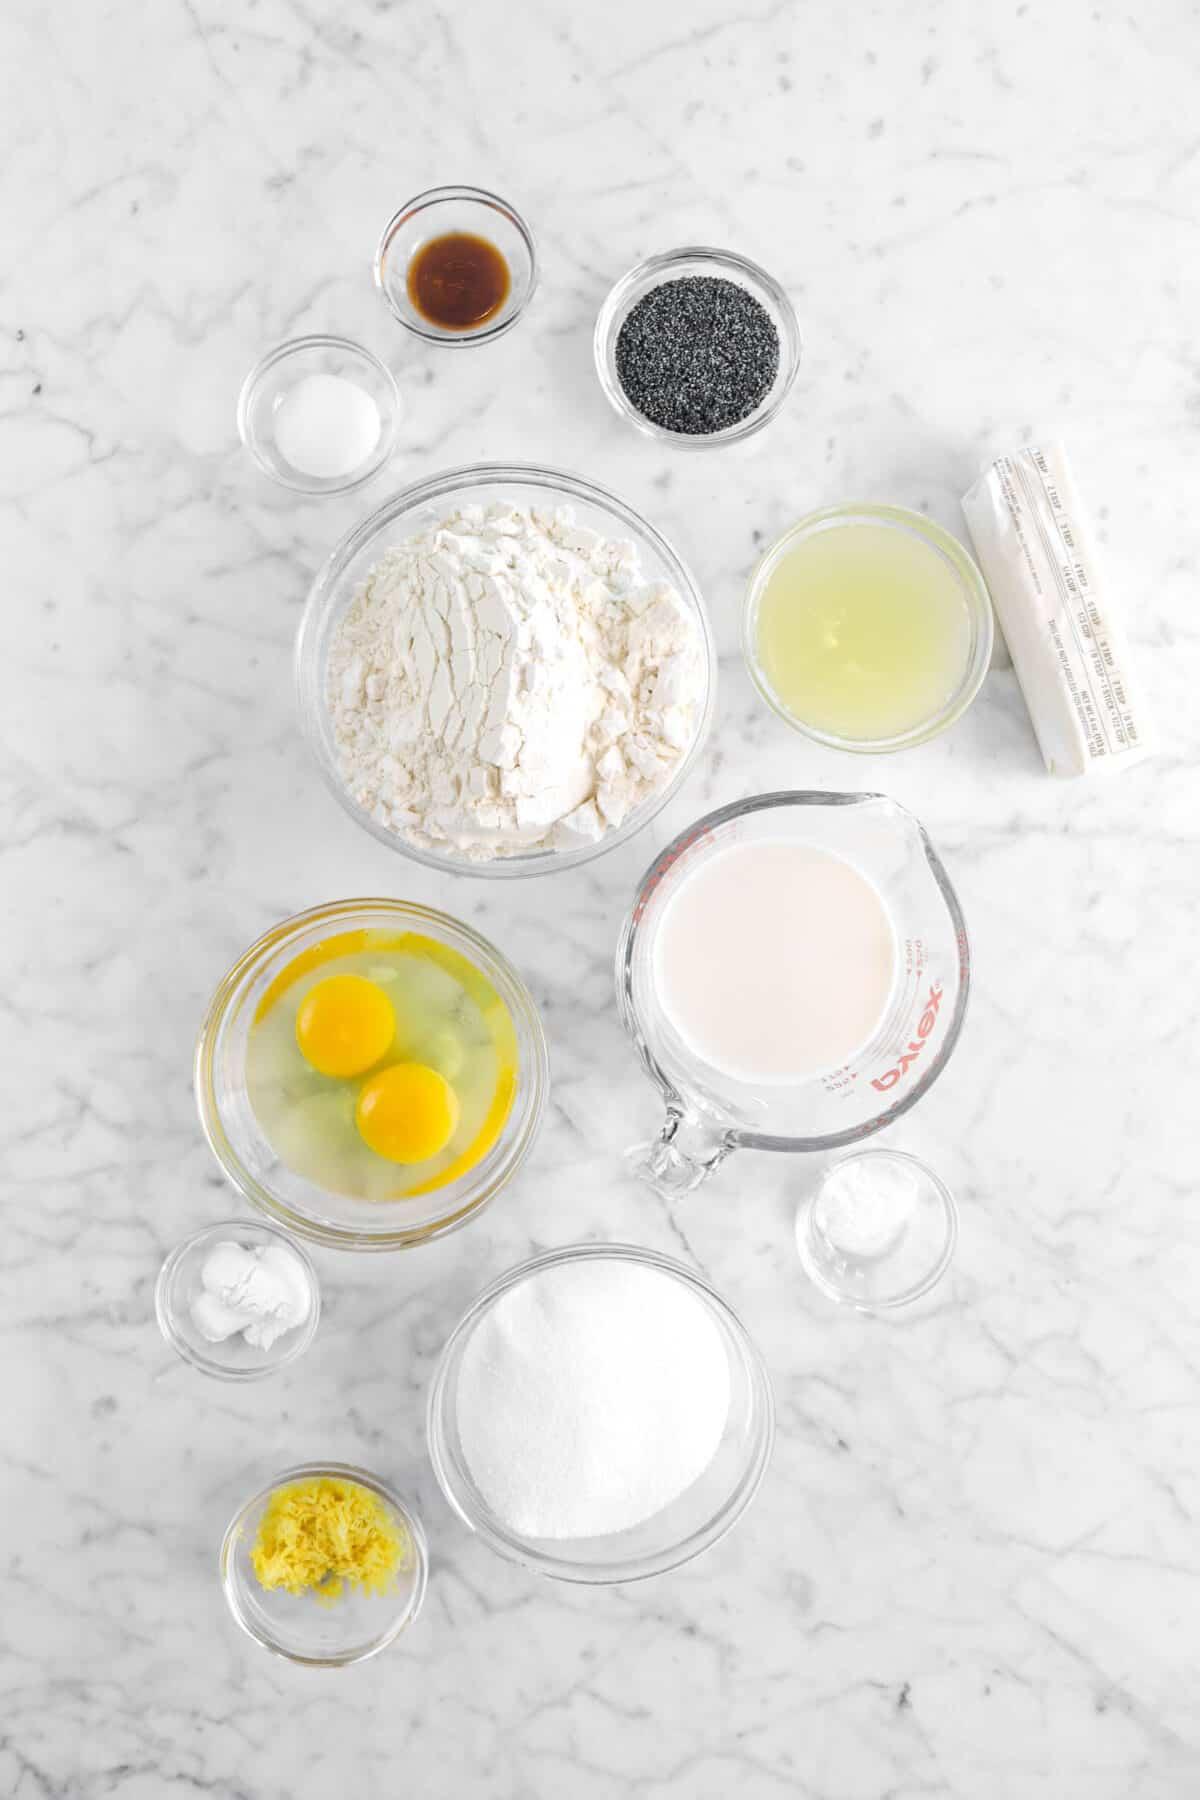 vanilla, poppy seeds, salt, flour, lemon juice, butter, milk, eggs, baking soda, sugar, baking powder, and lemon zest in glass bowls on marble counter